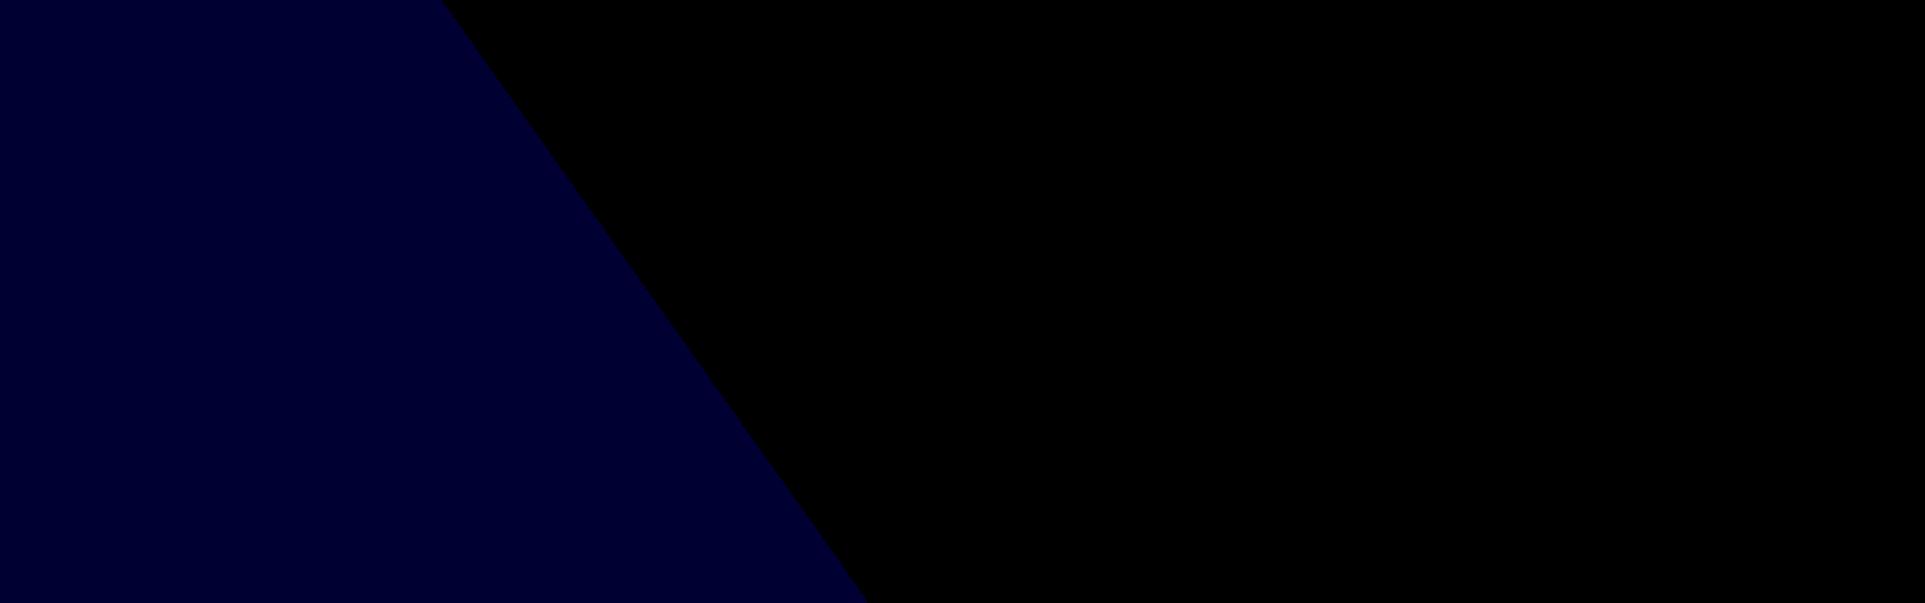 graficotalks3-02.png